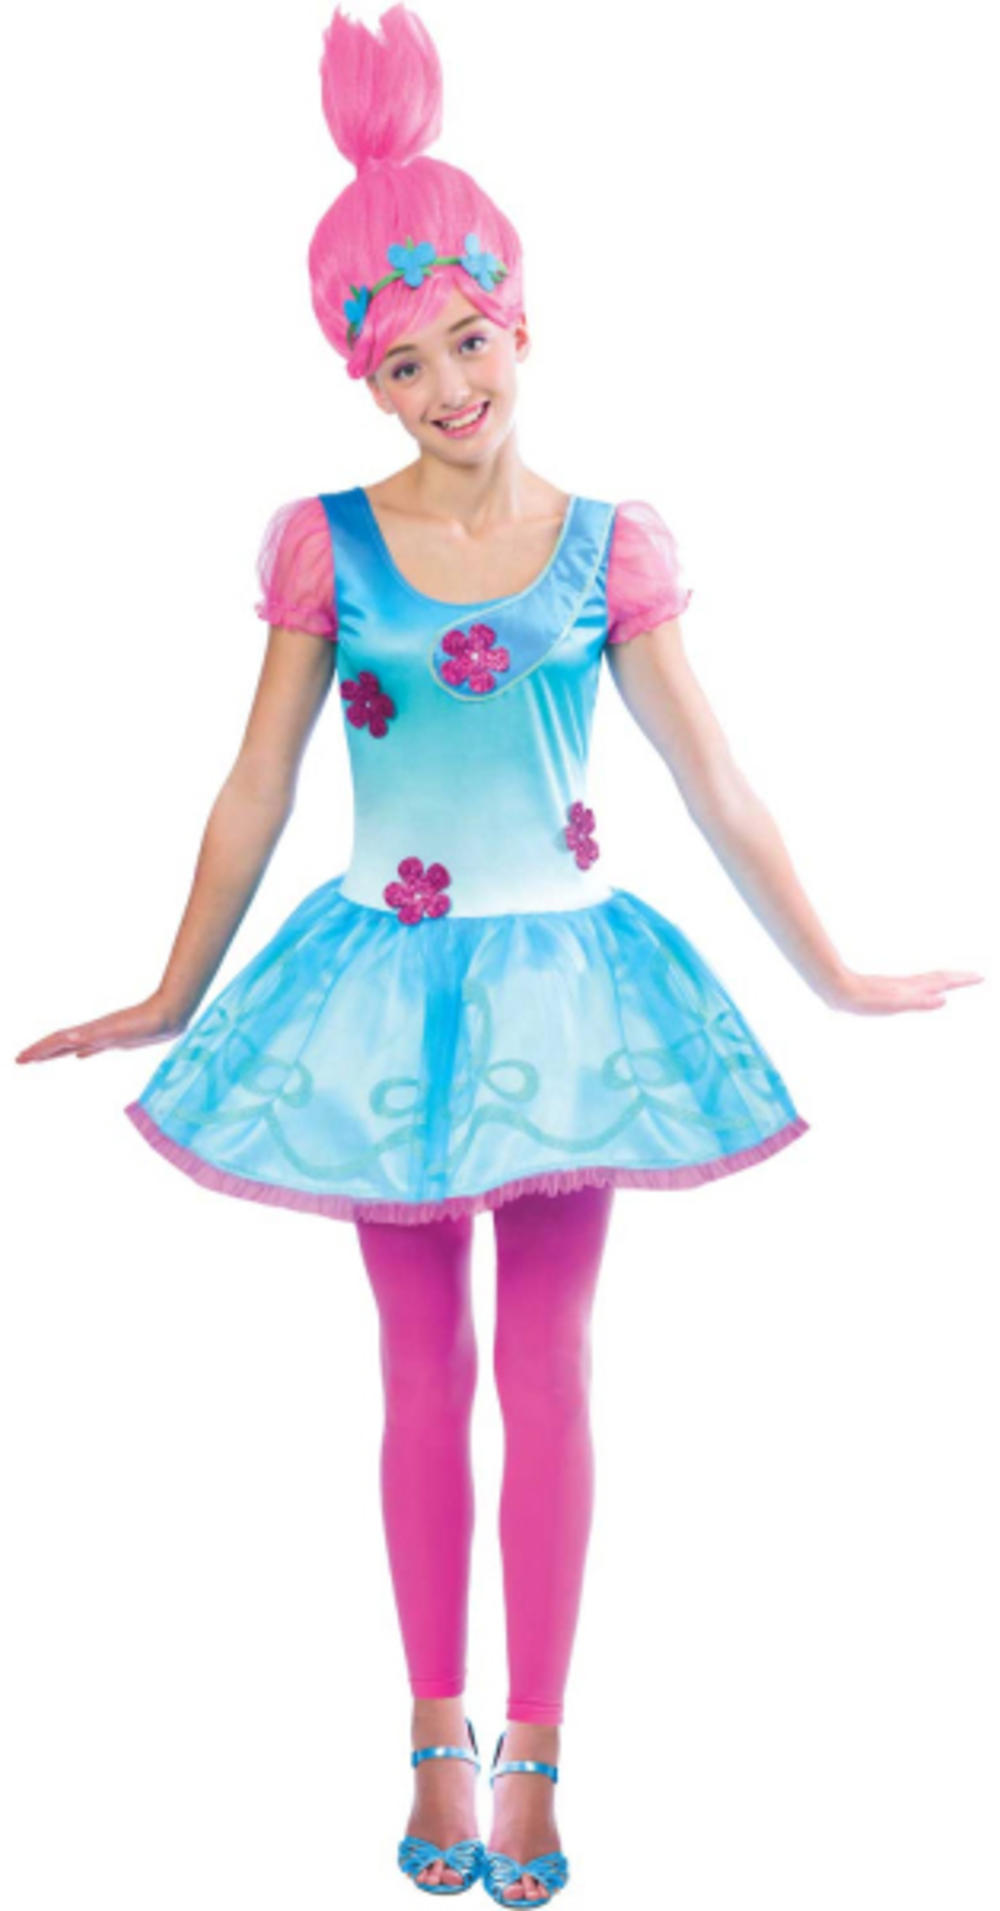 Trolls Princess Poppy Girls Teen Fancy Dress TV Film Cartoon Kids Childd Costume